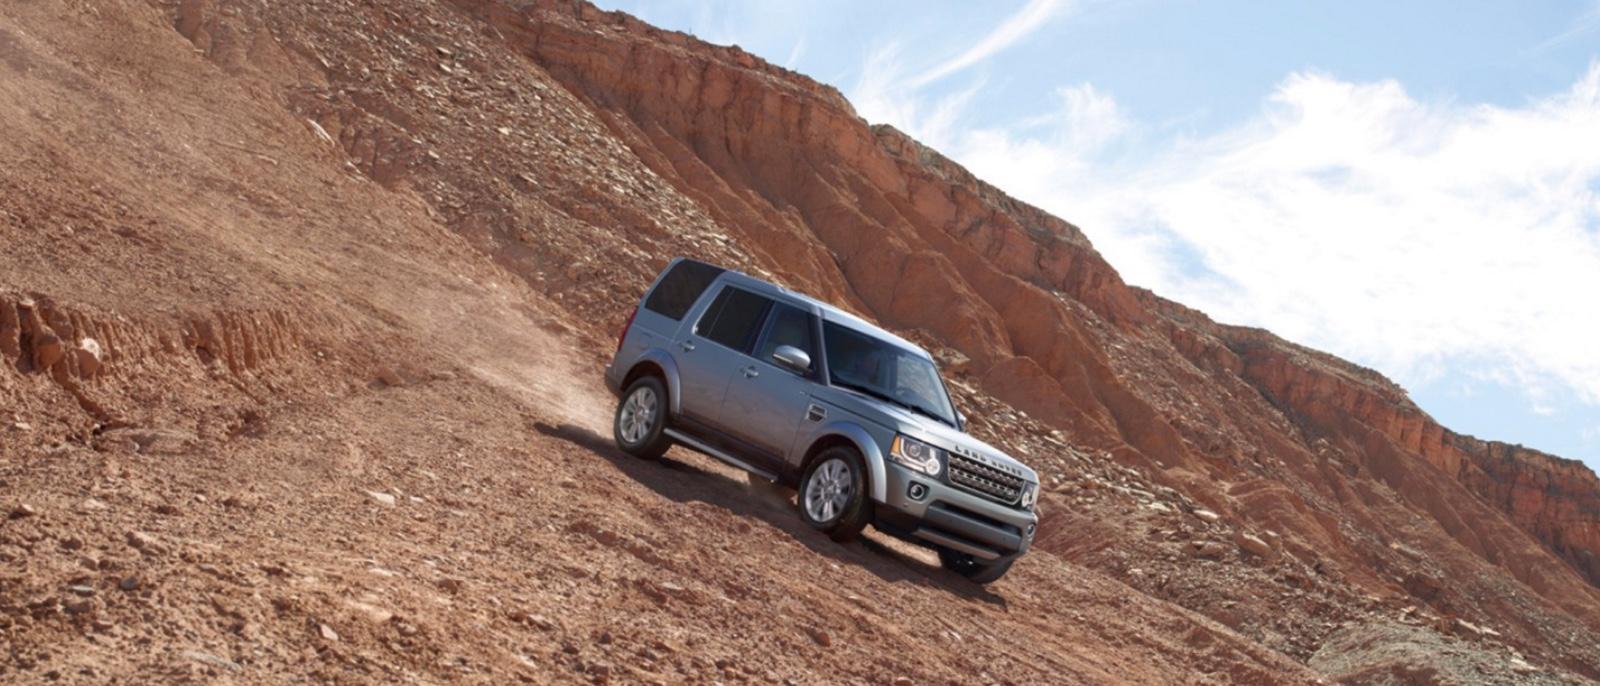 2016-Land-Rover-LR4-